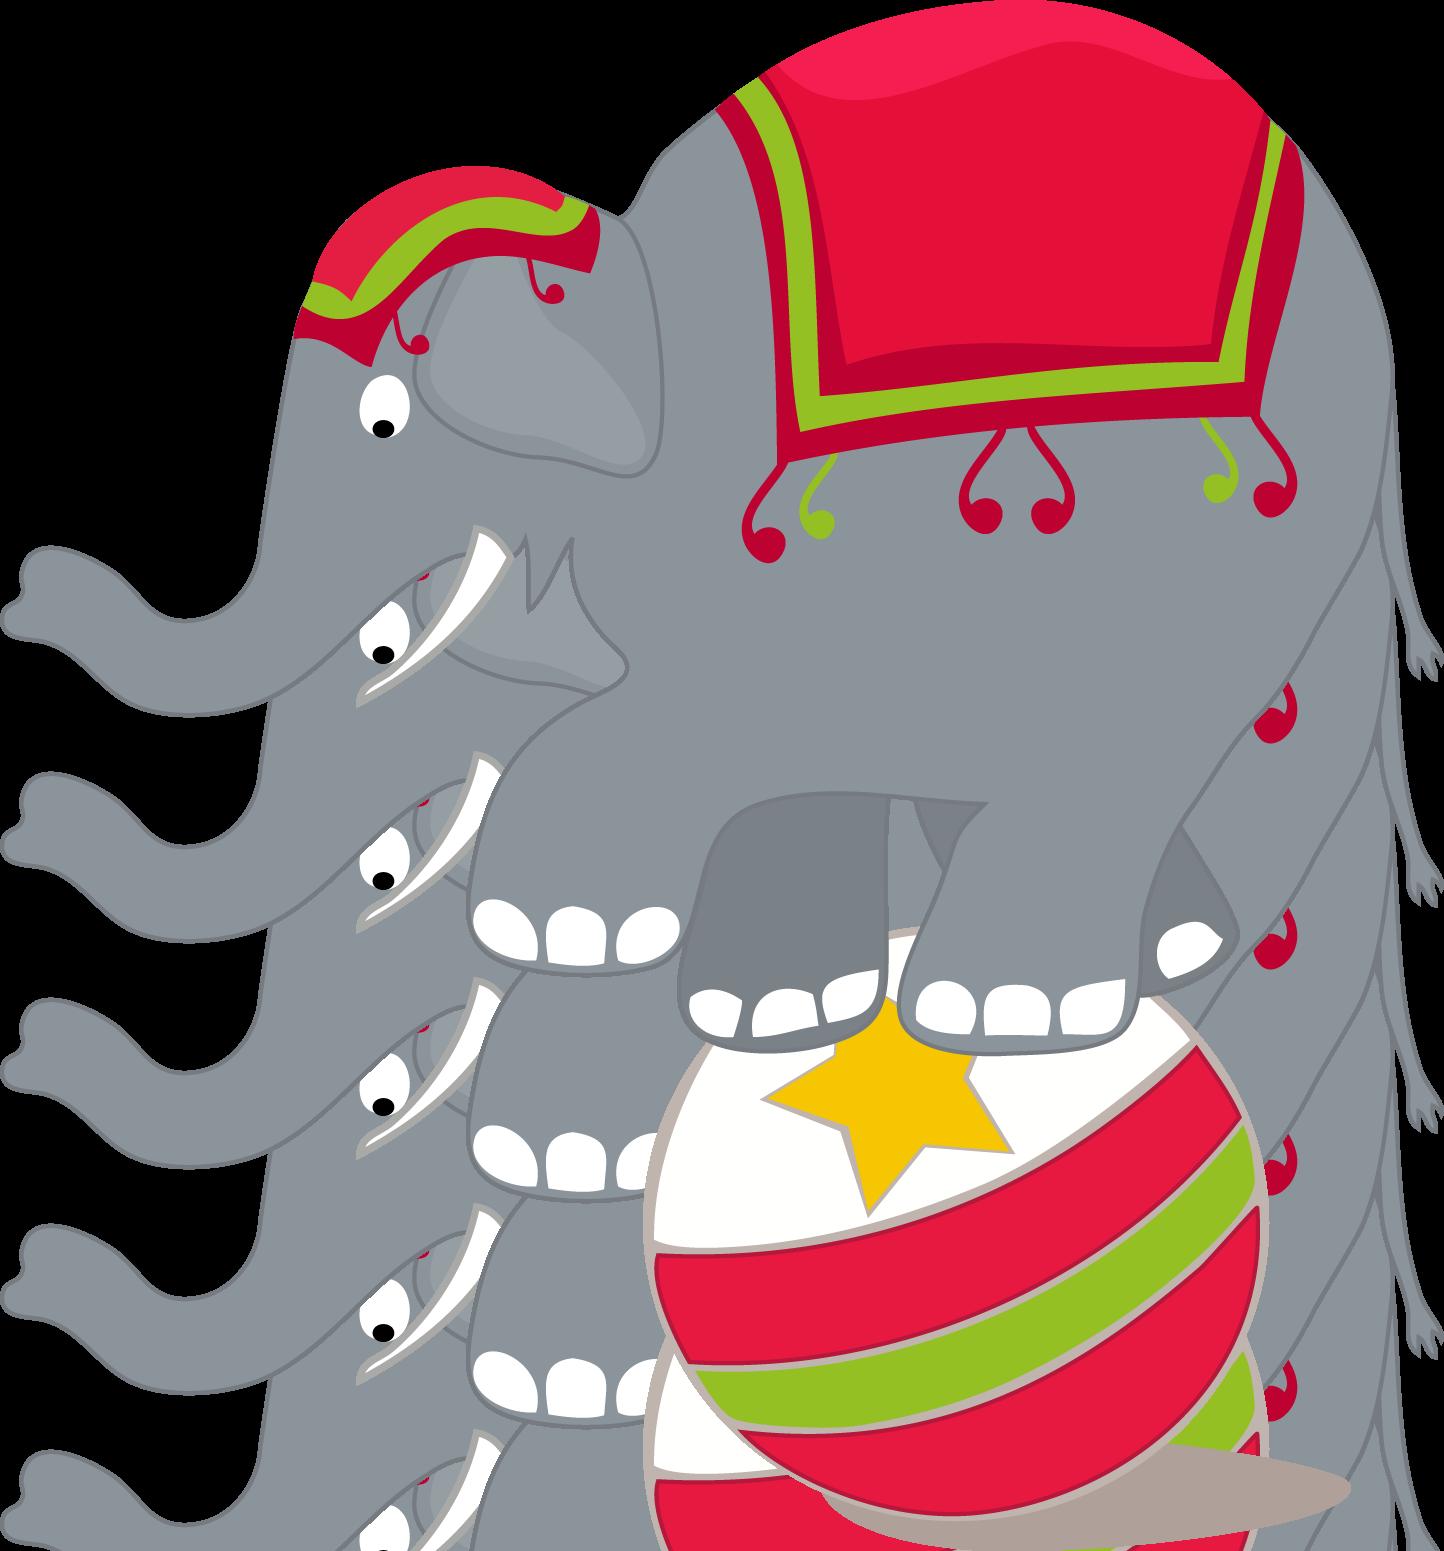 Elefante Circo Png.